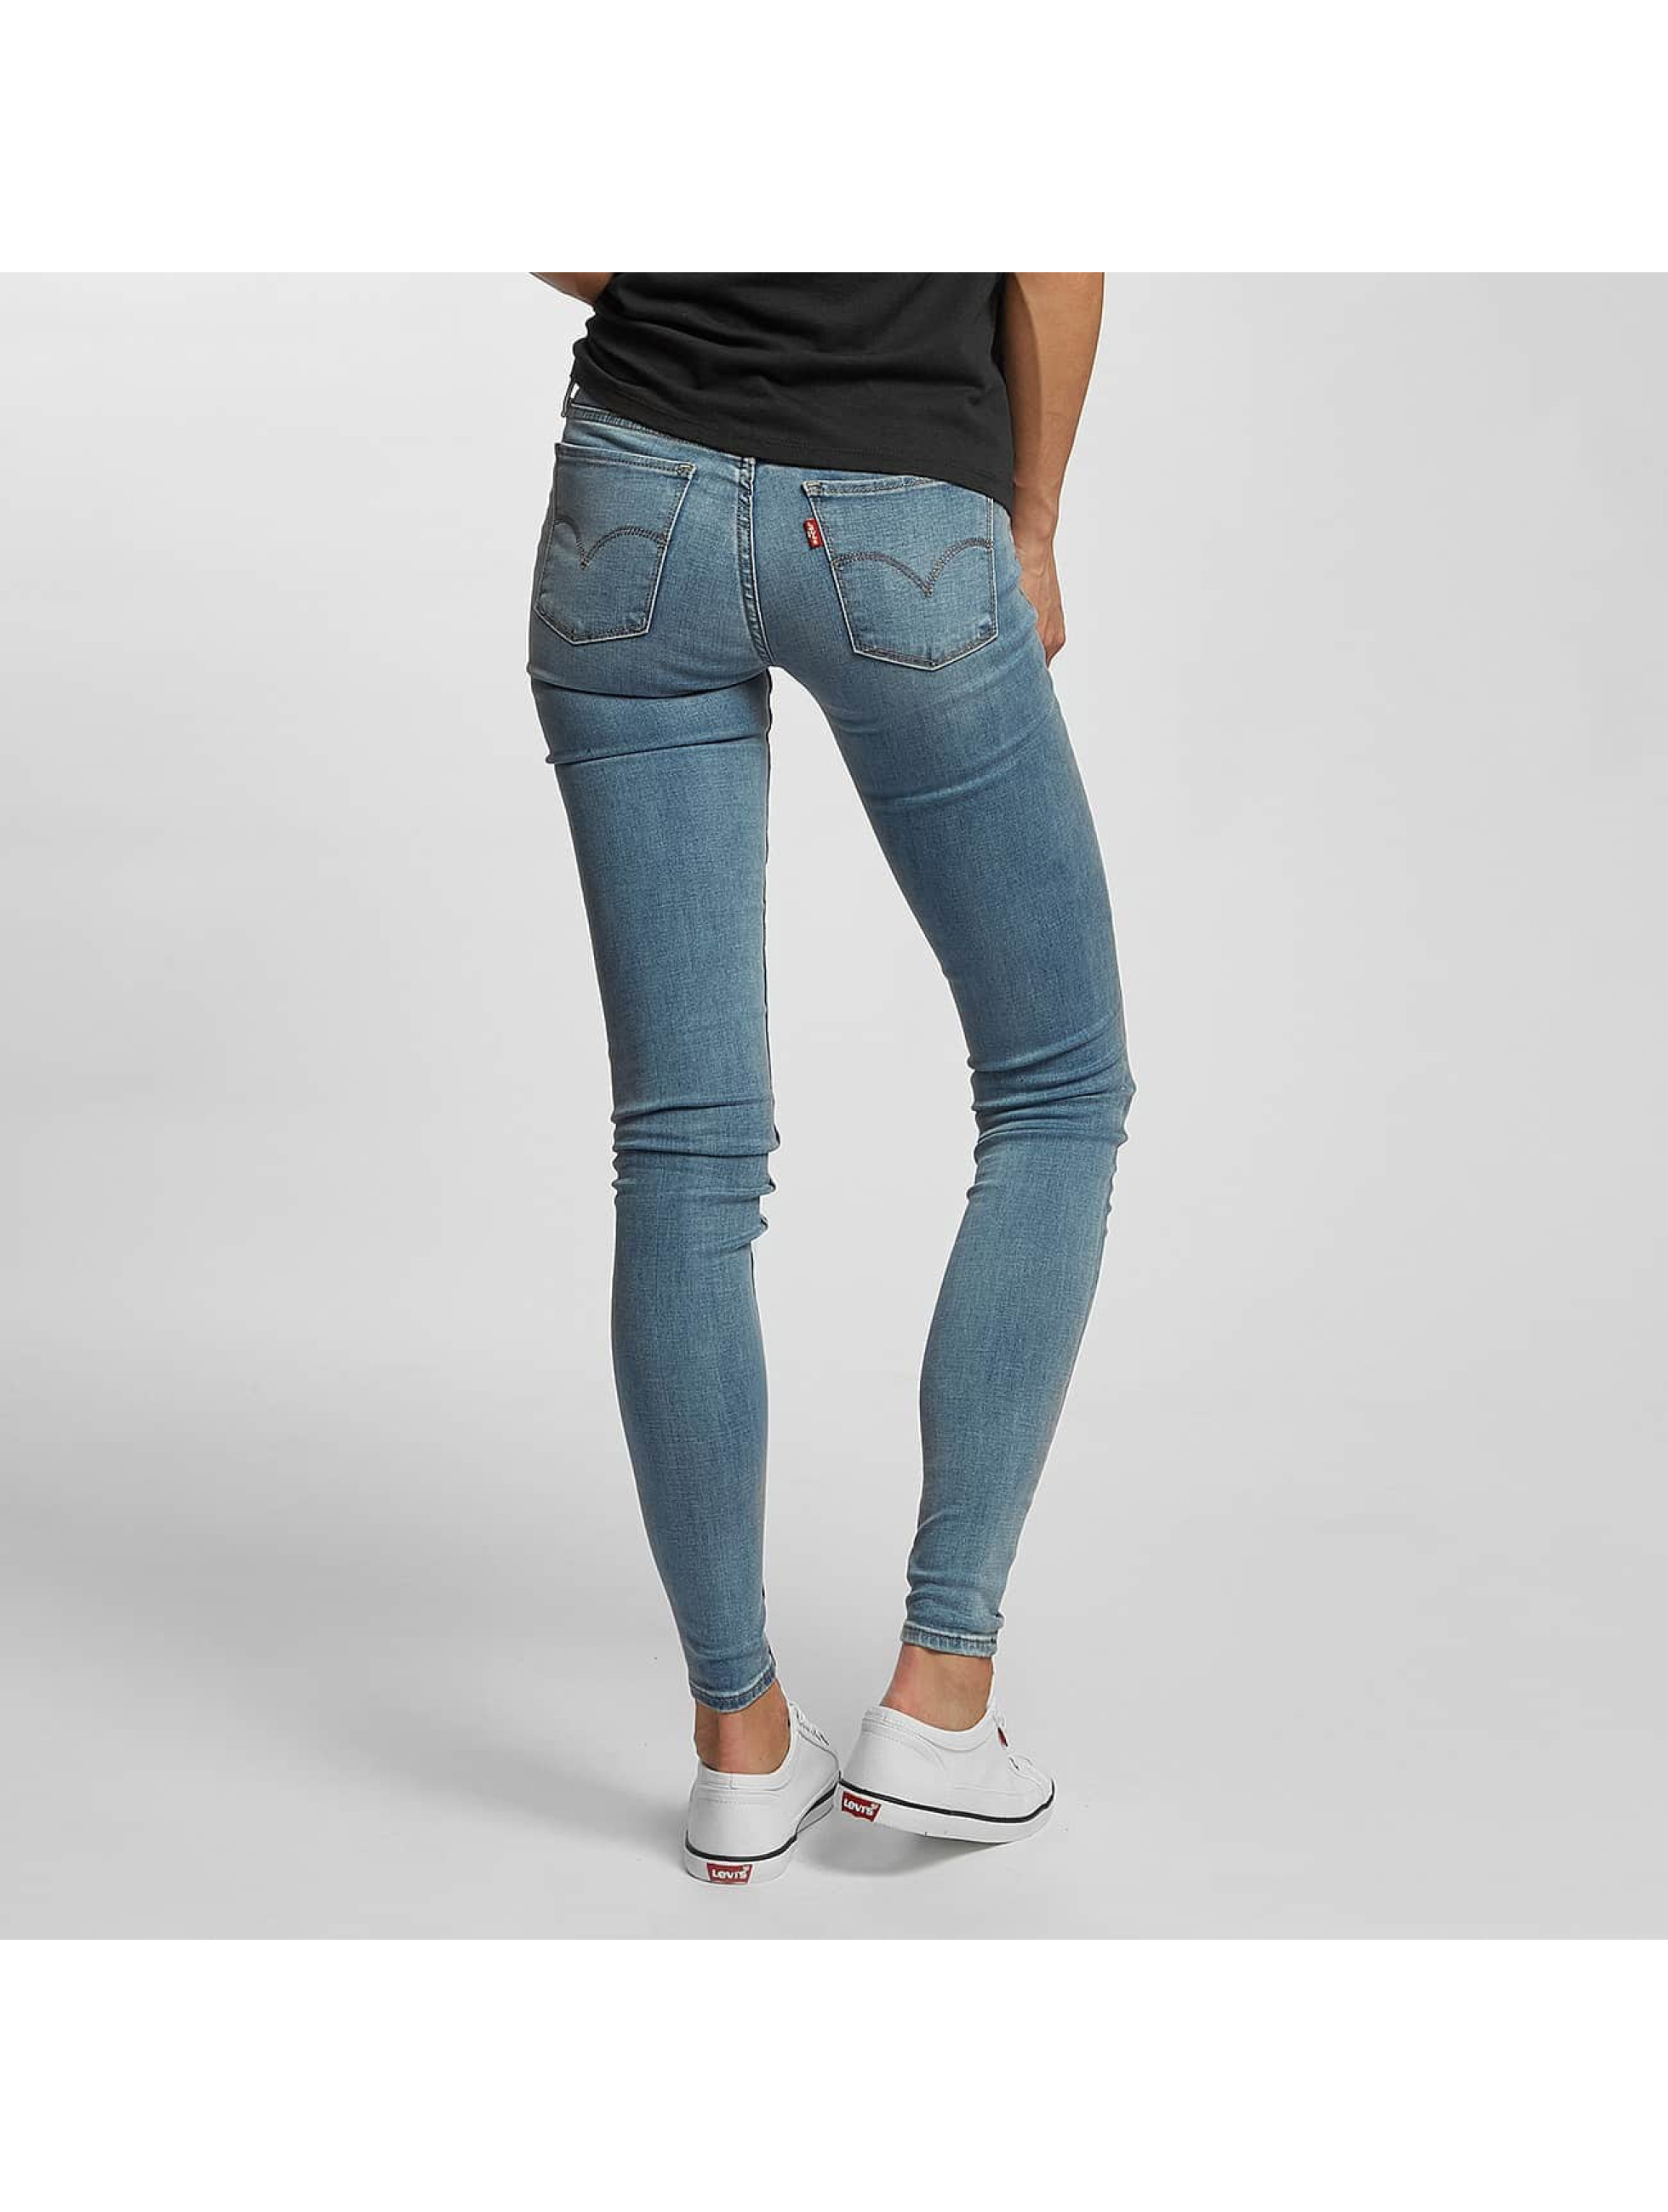 Levi's® Skinny Jeans Innovation 710 Super blau